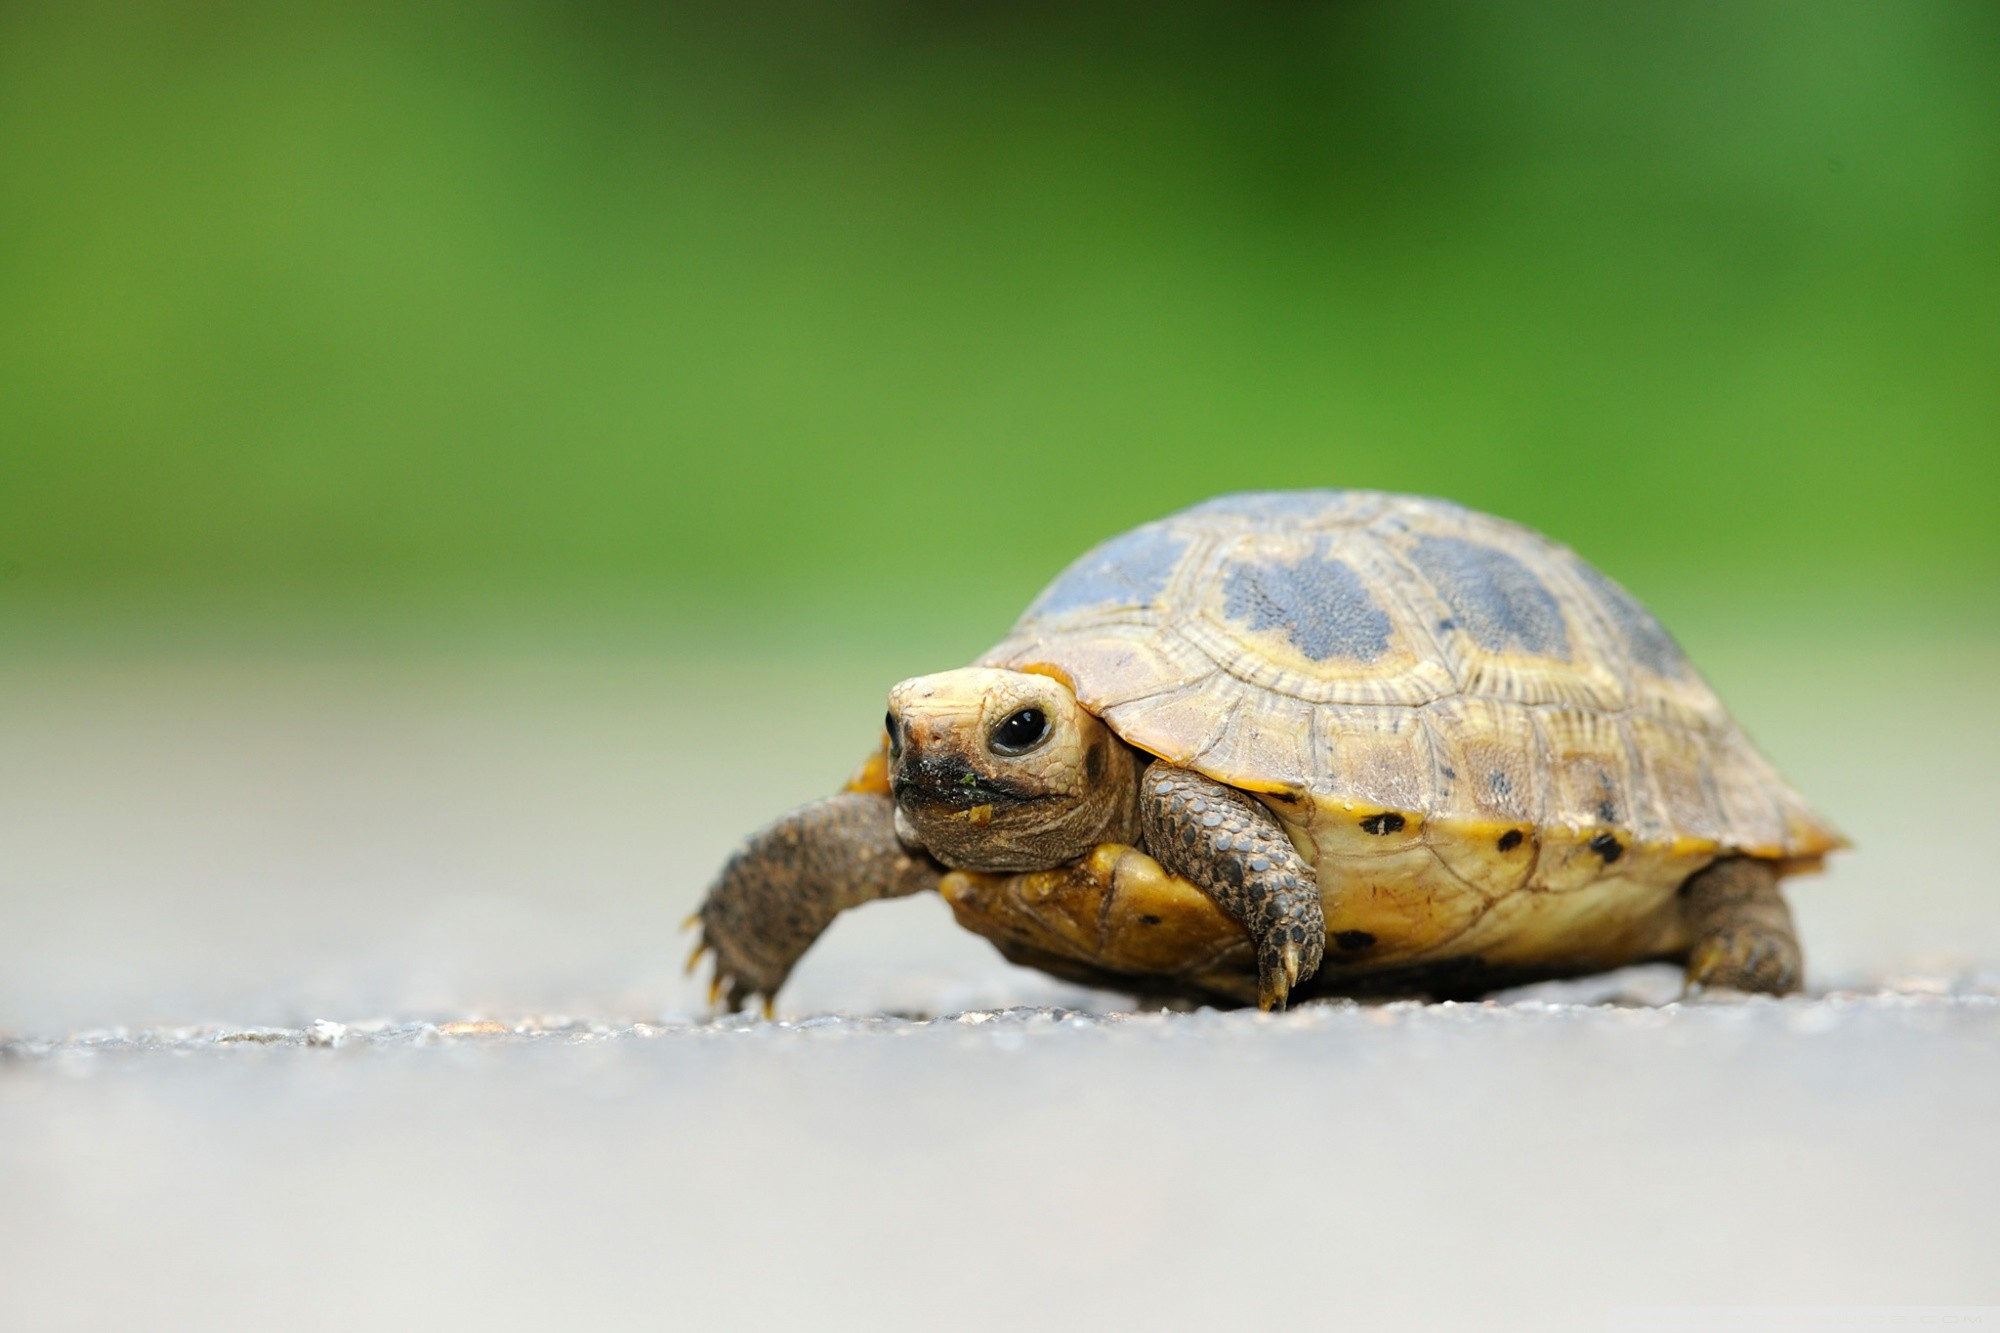 Baby Elongated Tortoise HD Wide Wallpaper for Widescreen